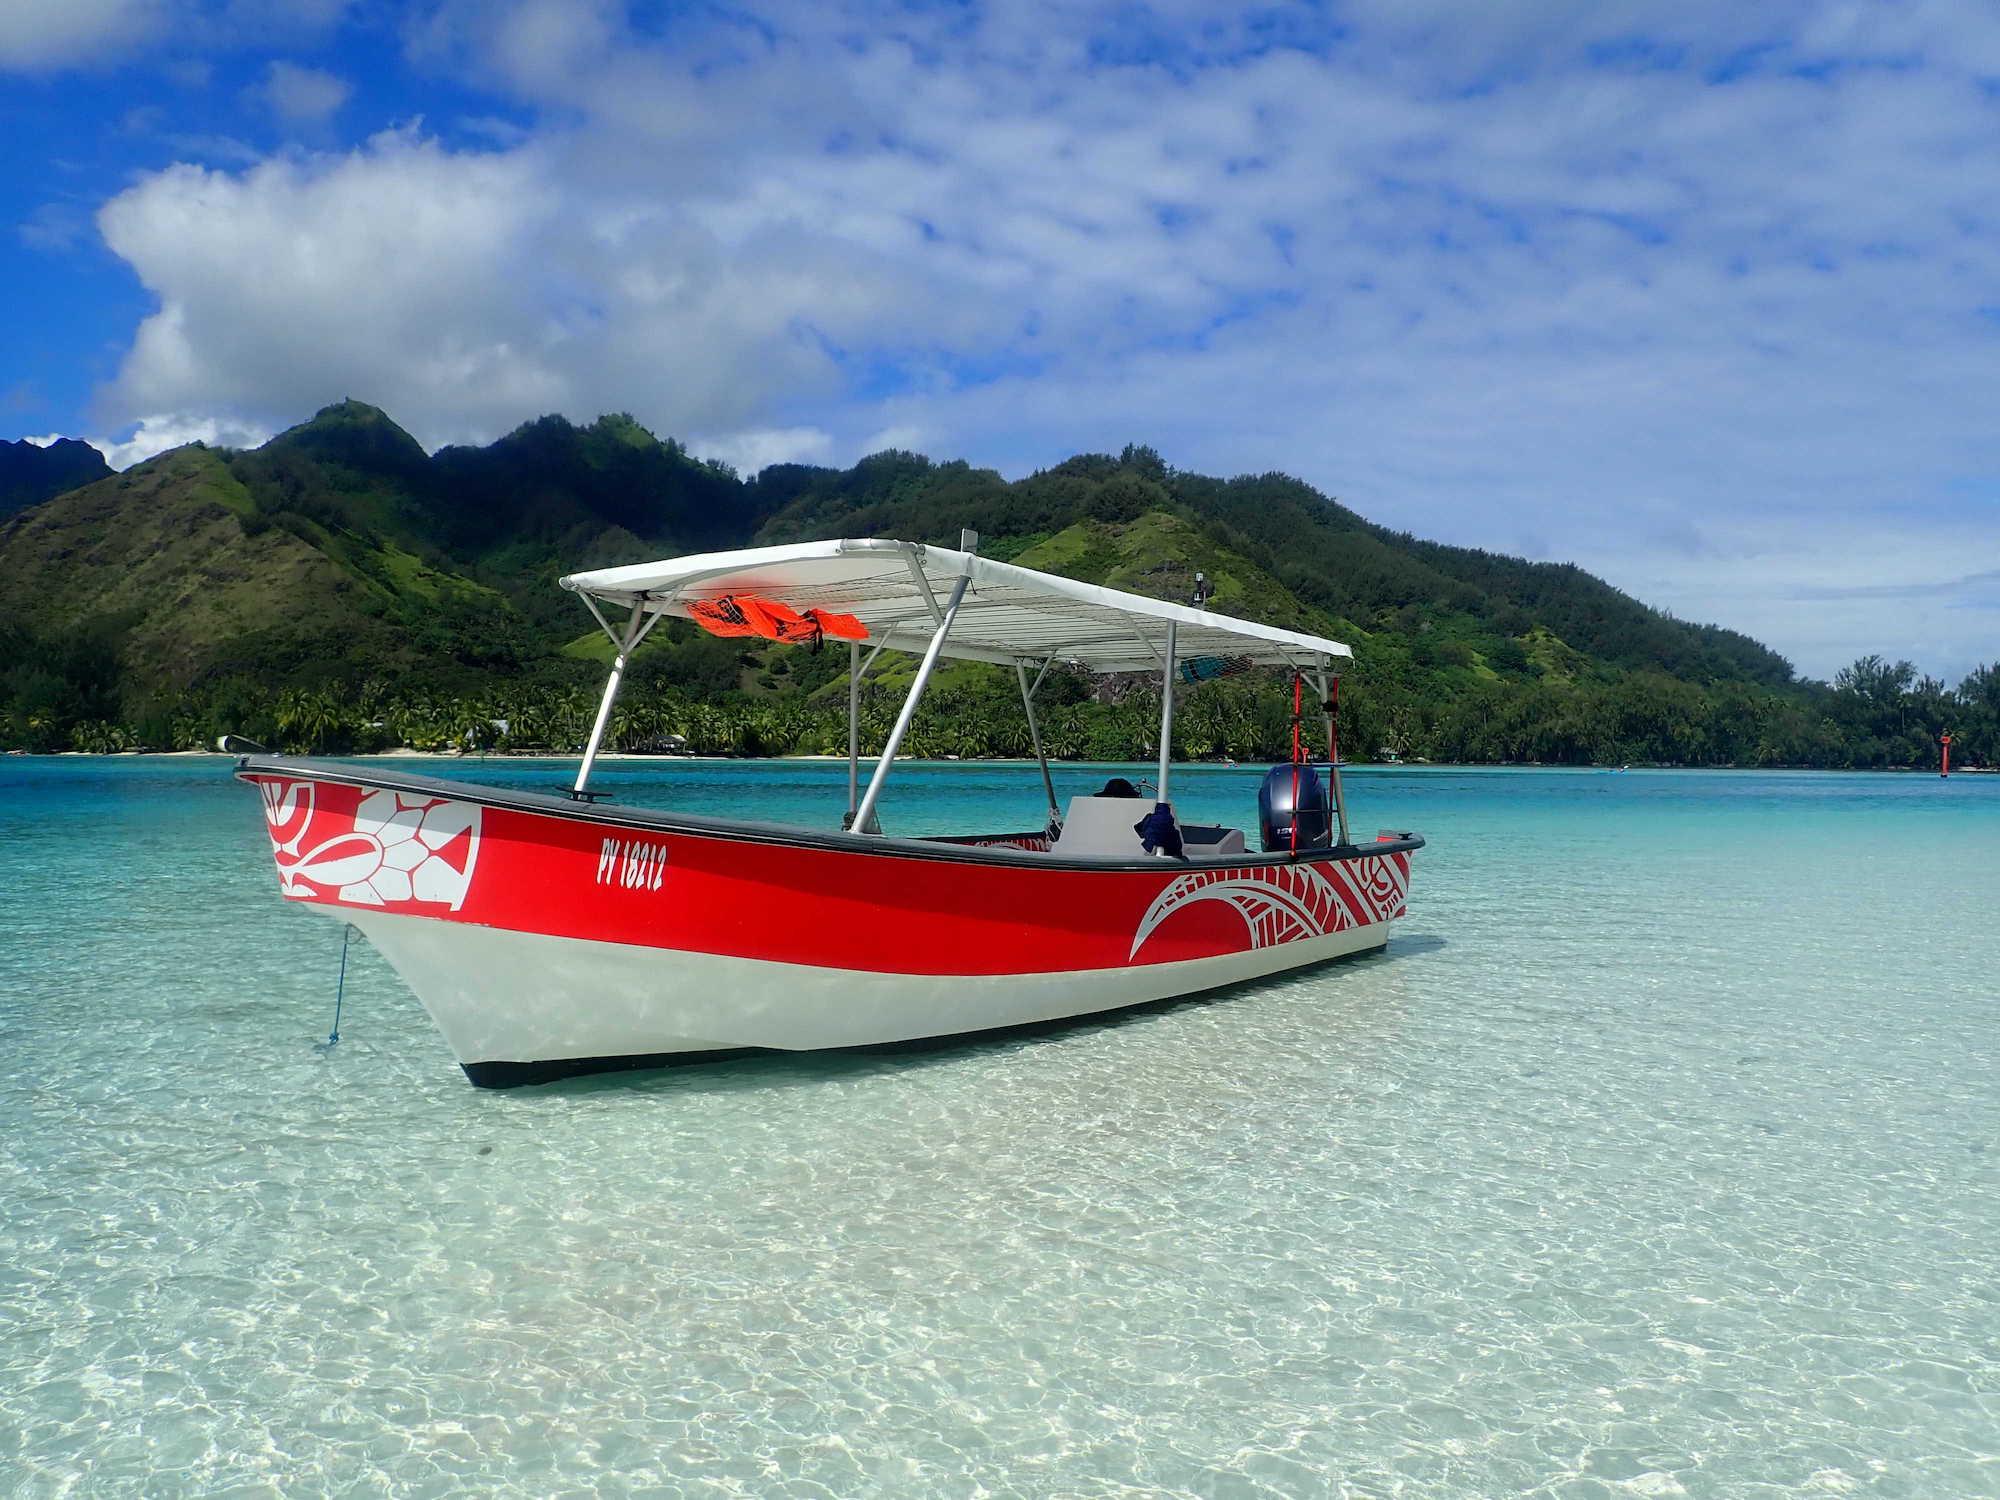 https://tahititourisme.kr/wp-content/uploads/2020/09/Boat-Hinaloa.jpg